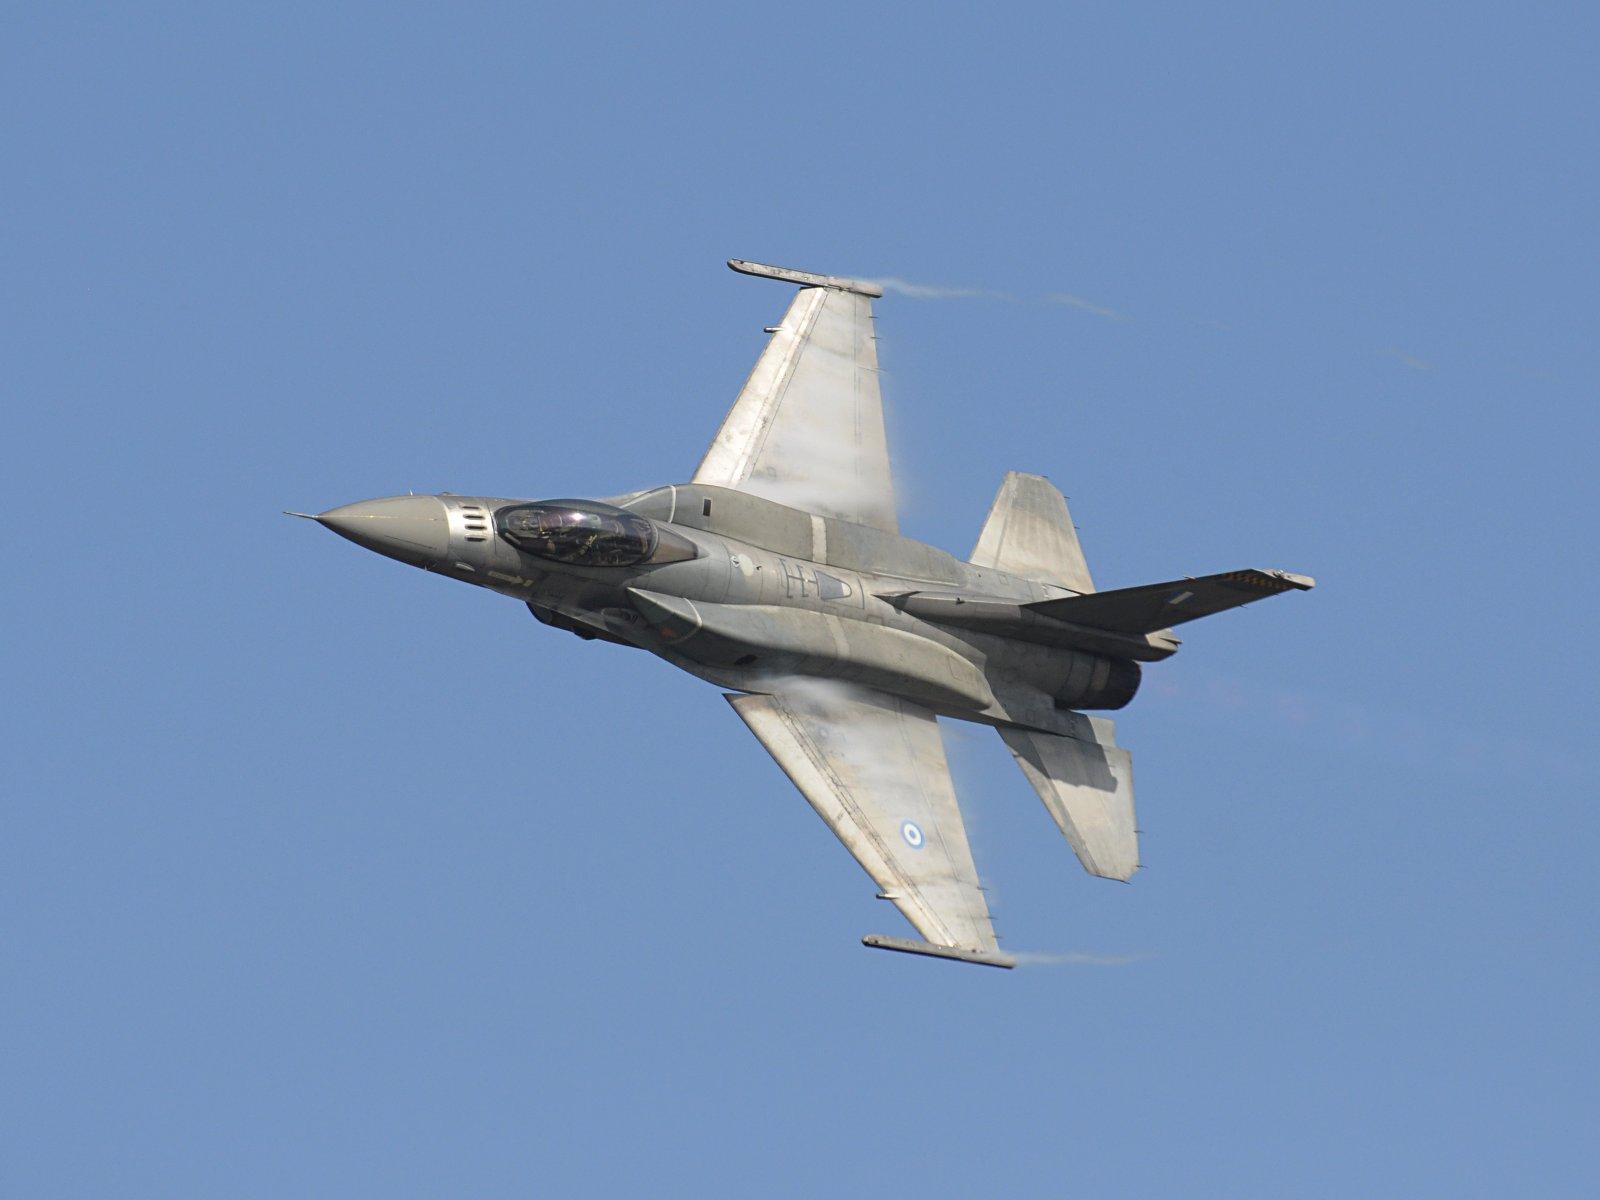 F 16 jet fighter